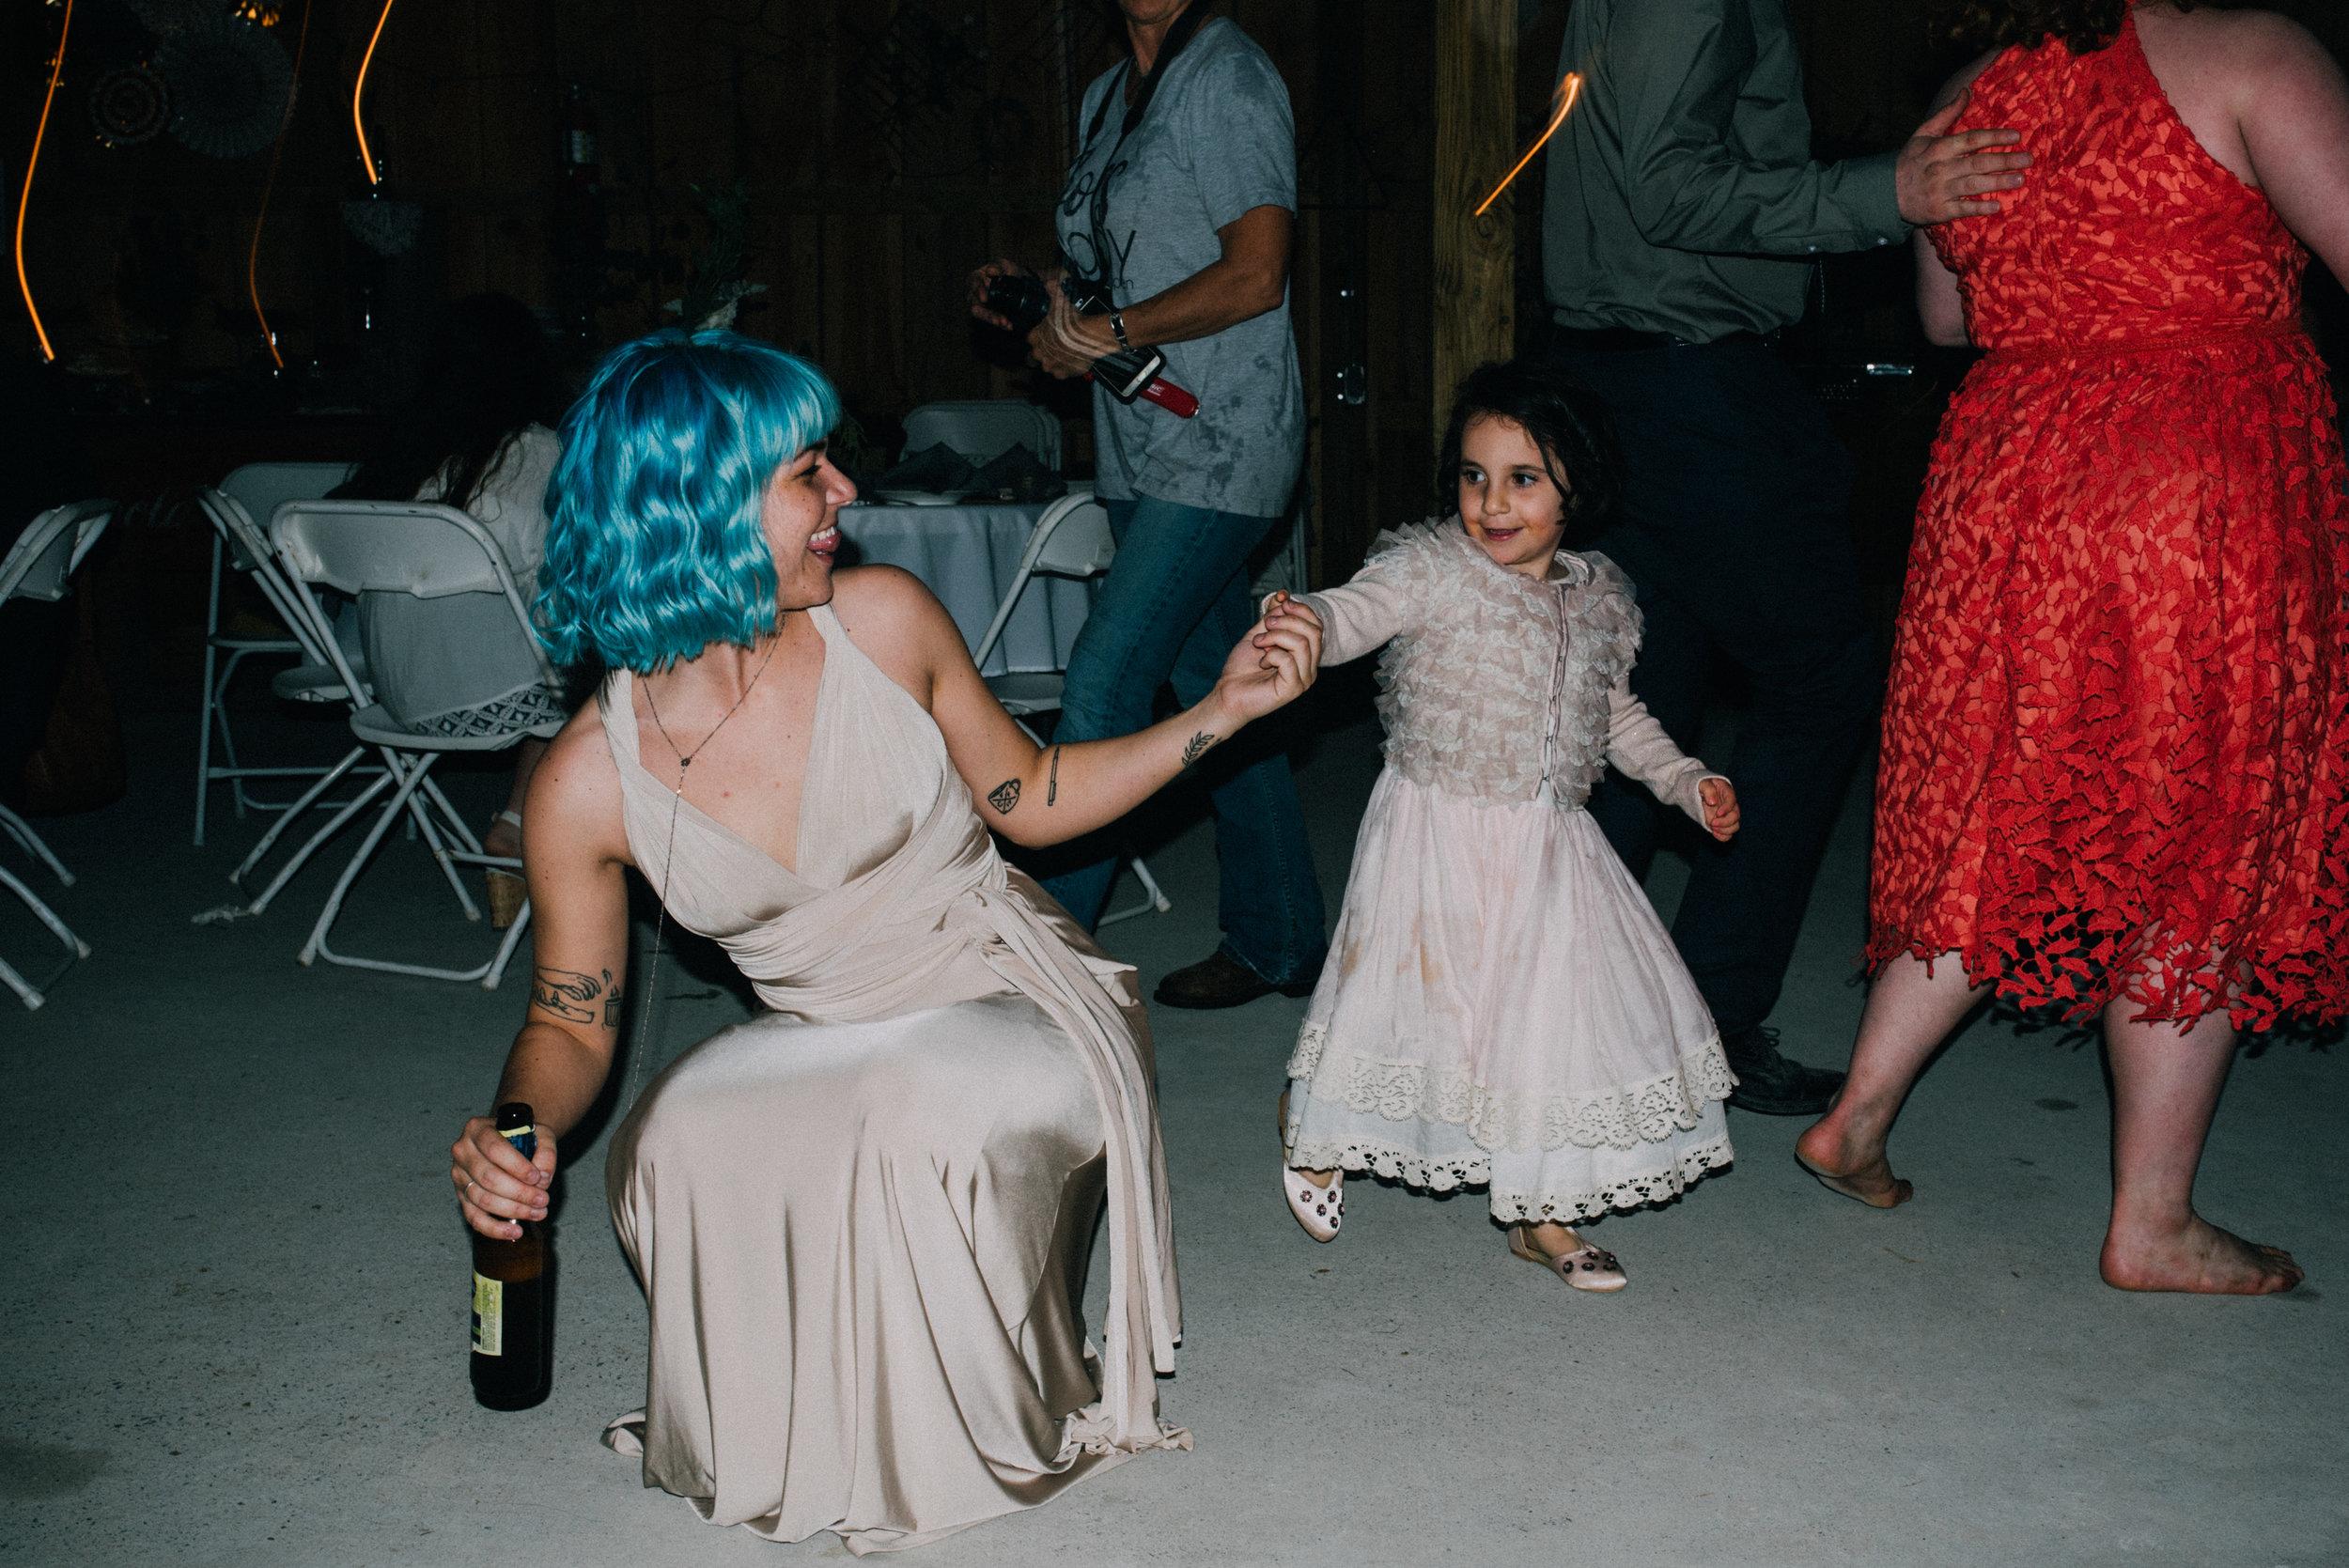 blue hair bridesmaid dancing with flower girl